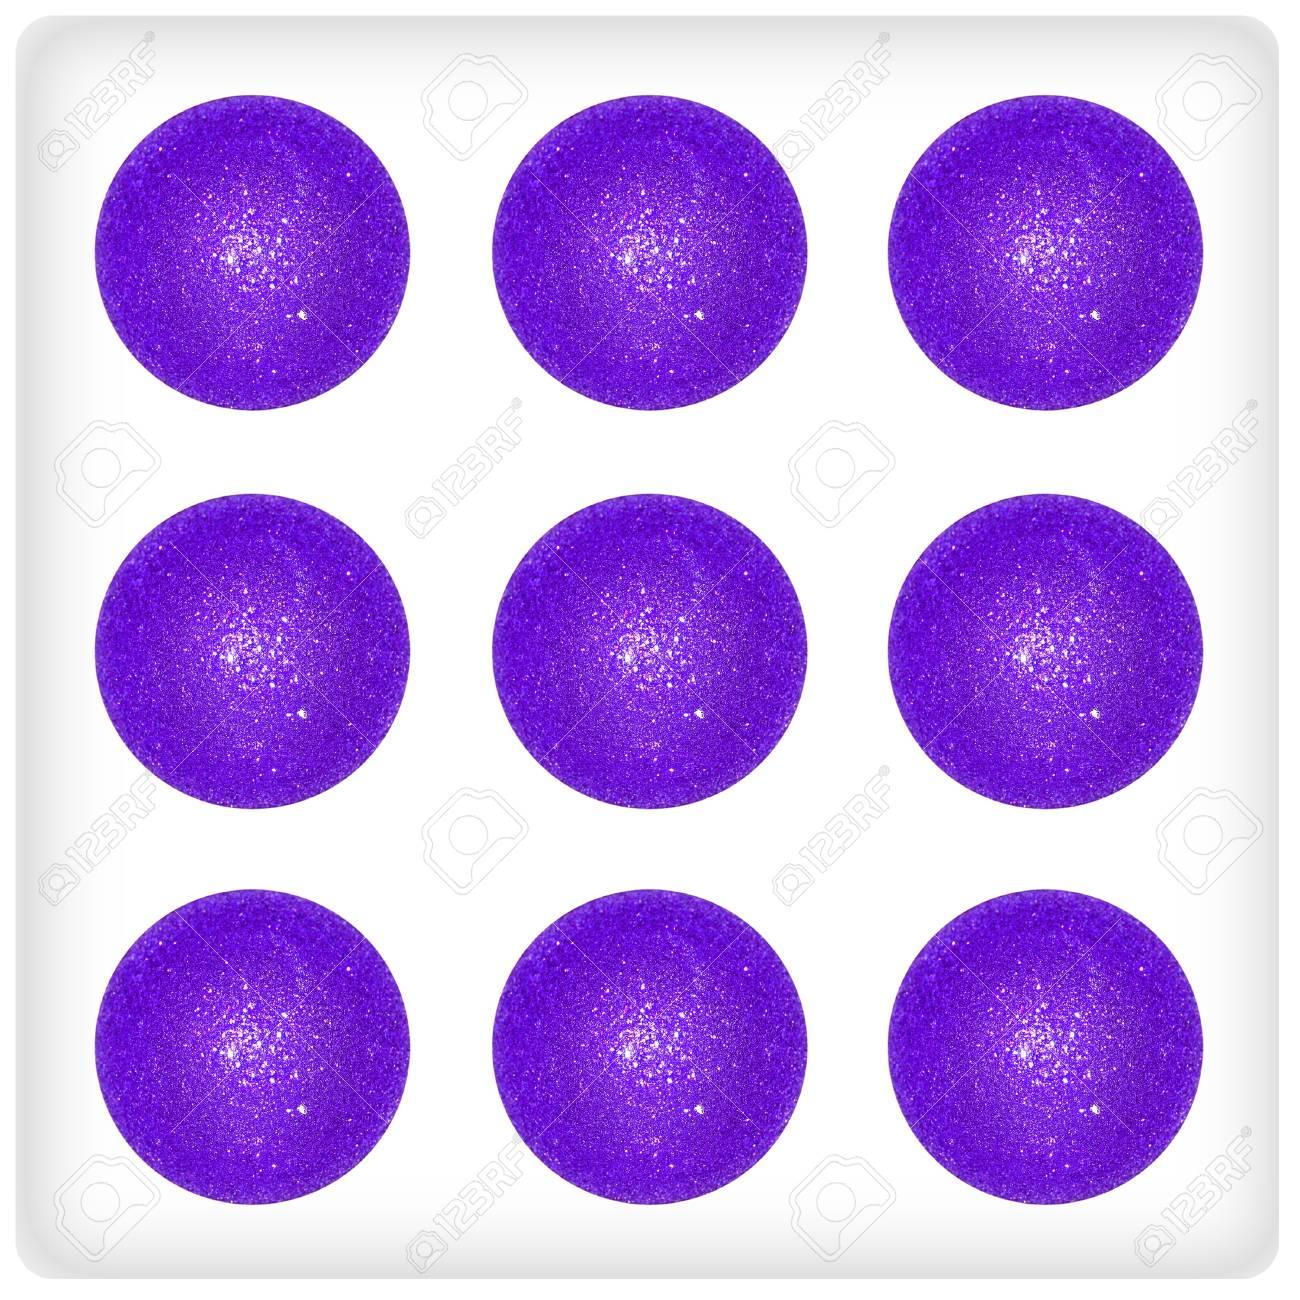 Nine, xmas, balls, dice, game, play, funny Stock Photo - 13113195